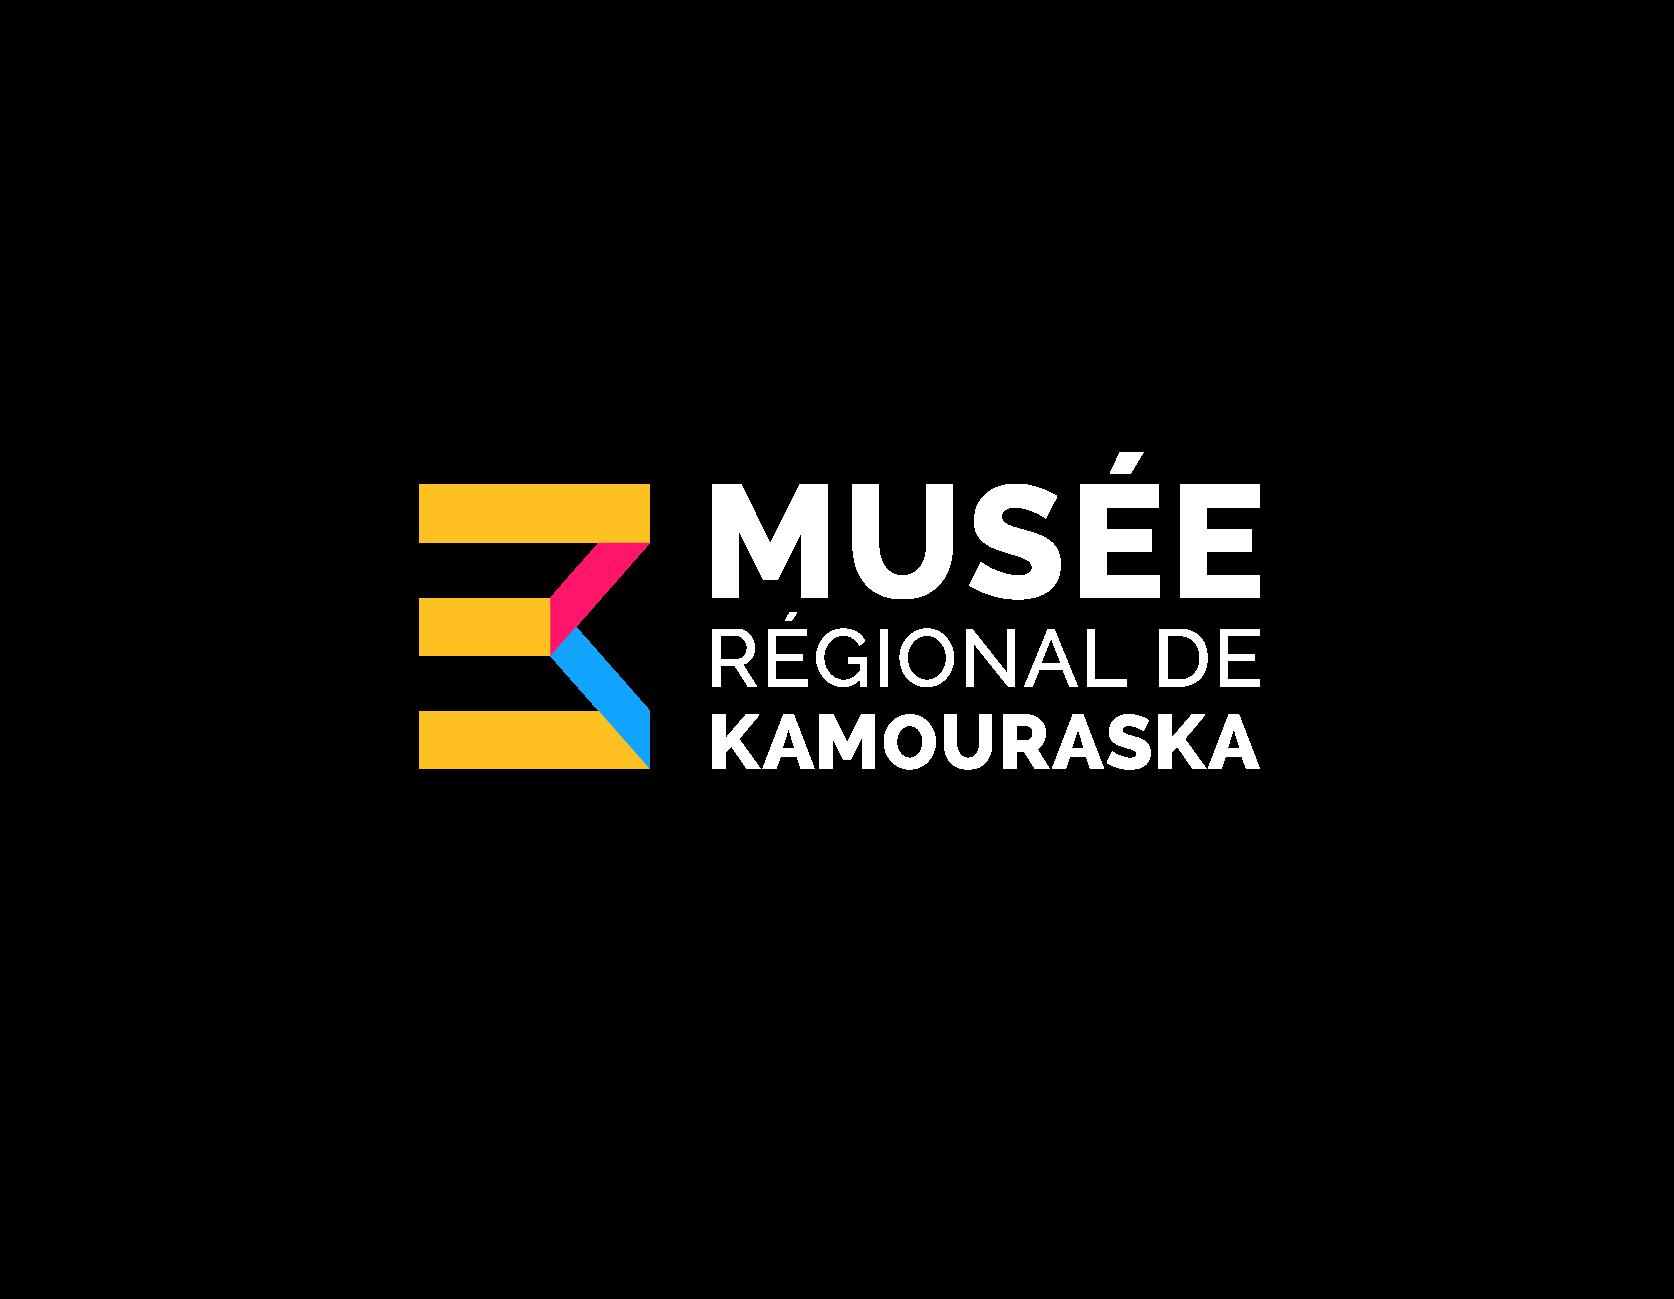 Musée régional de Kamouraska